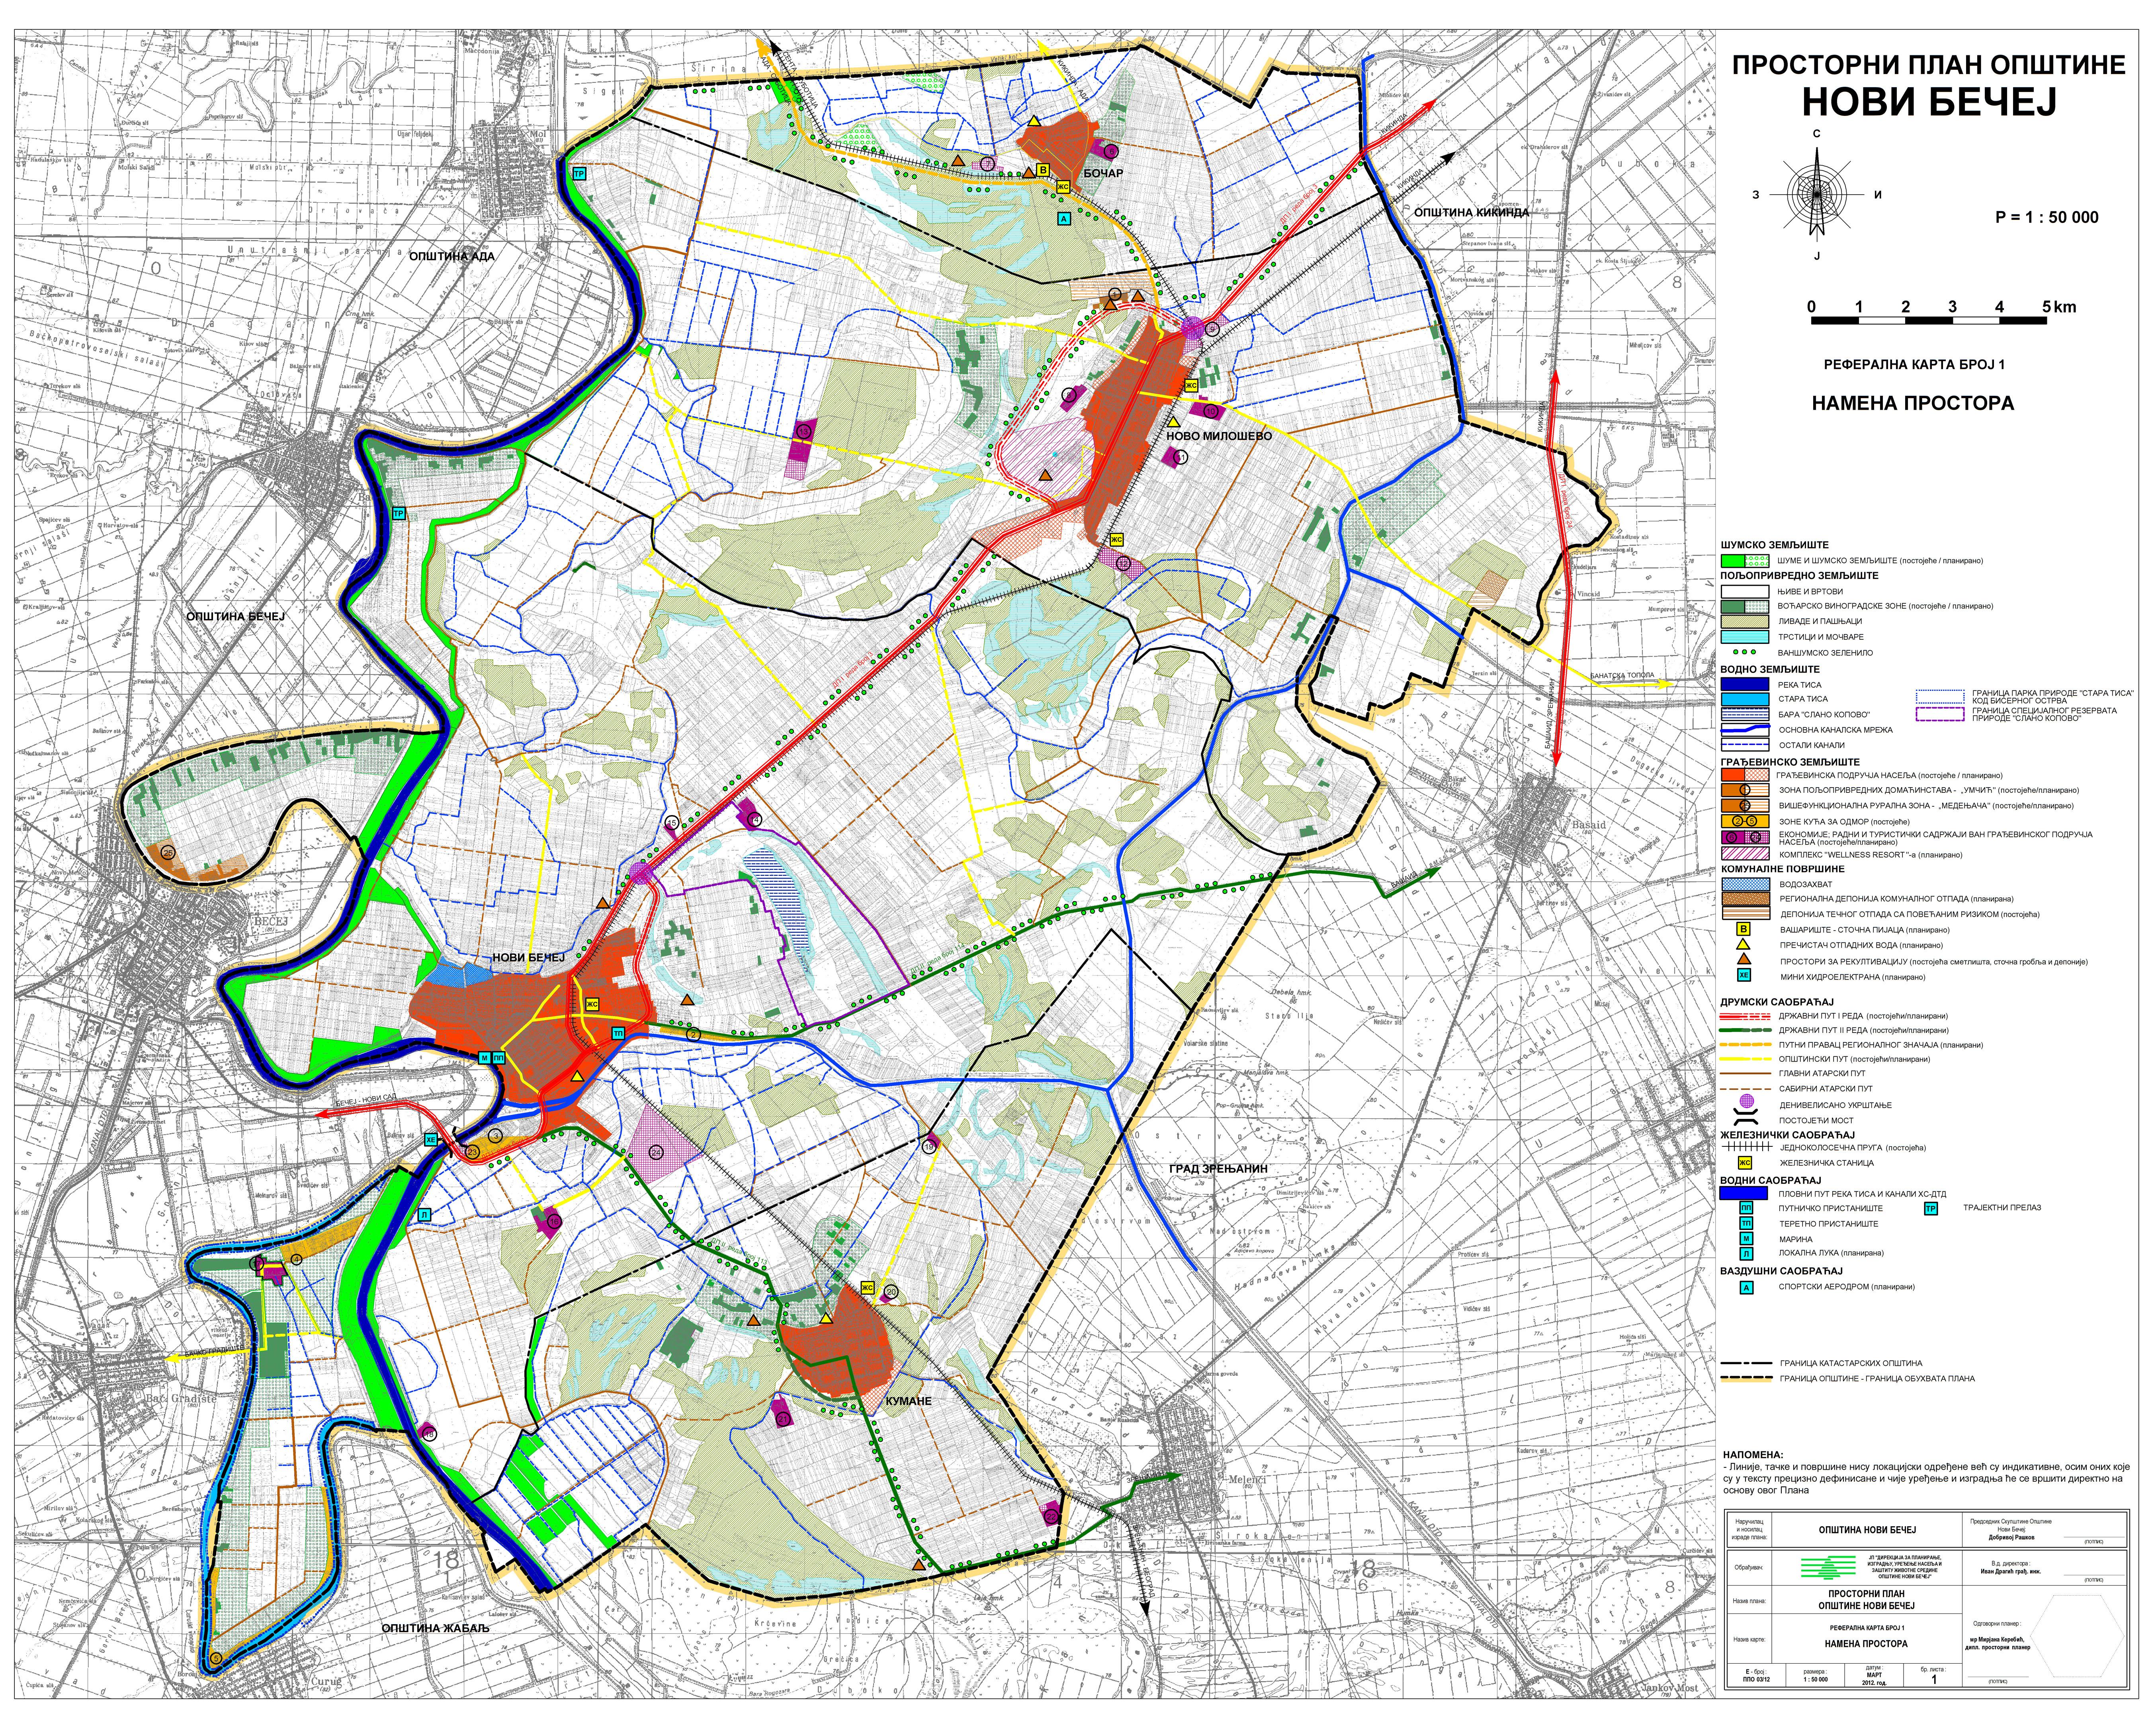 novi becej mapa Opština Novi Bečej novi becej mapa